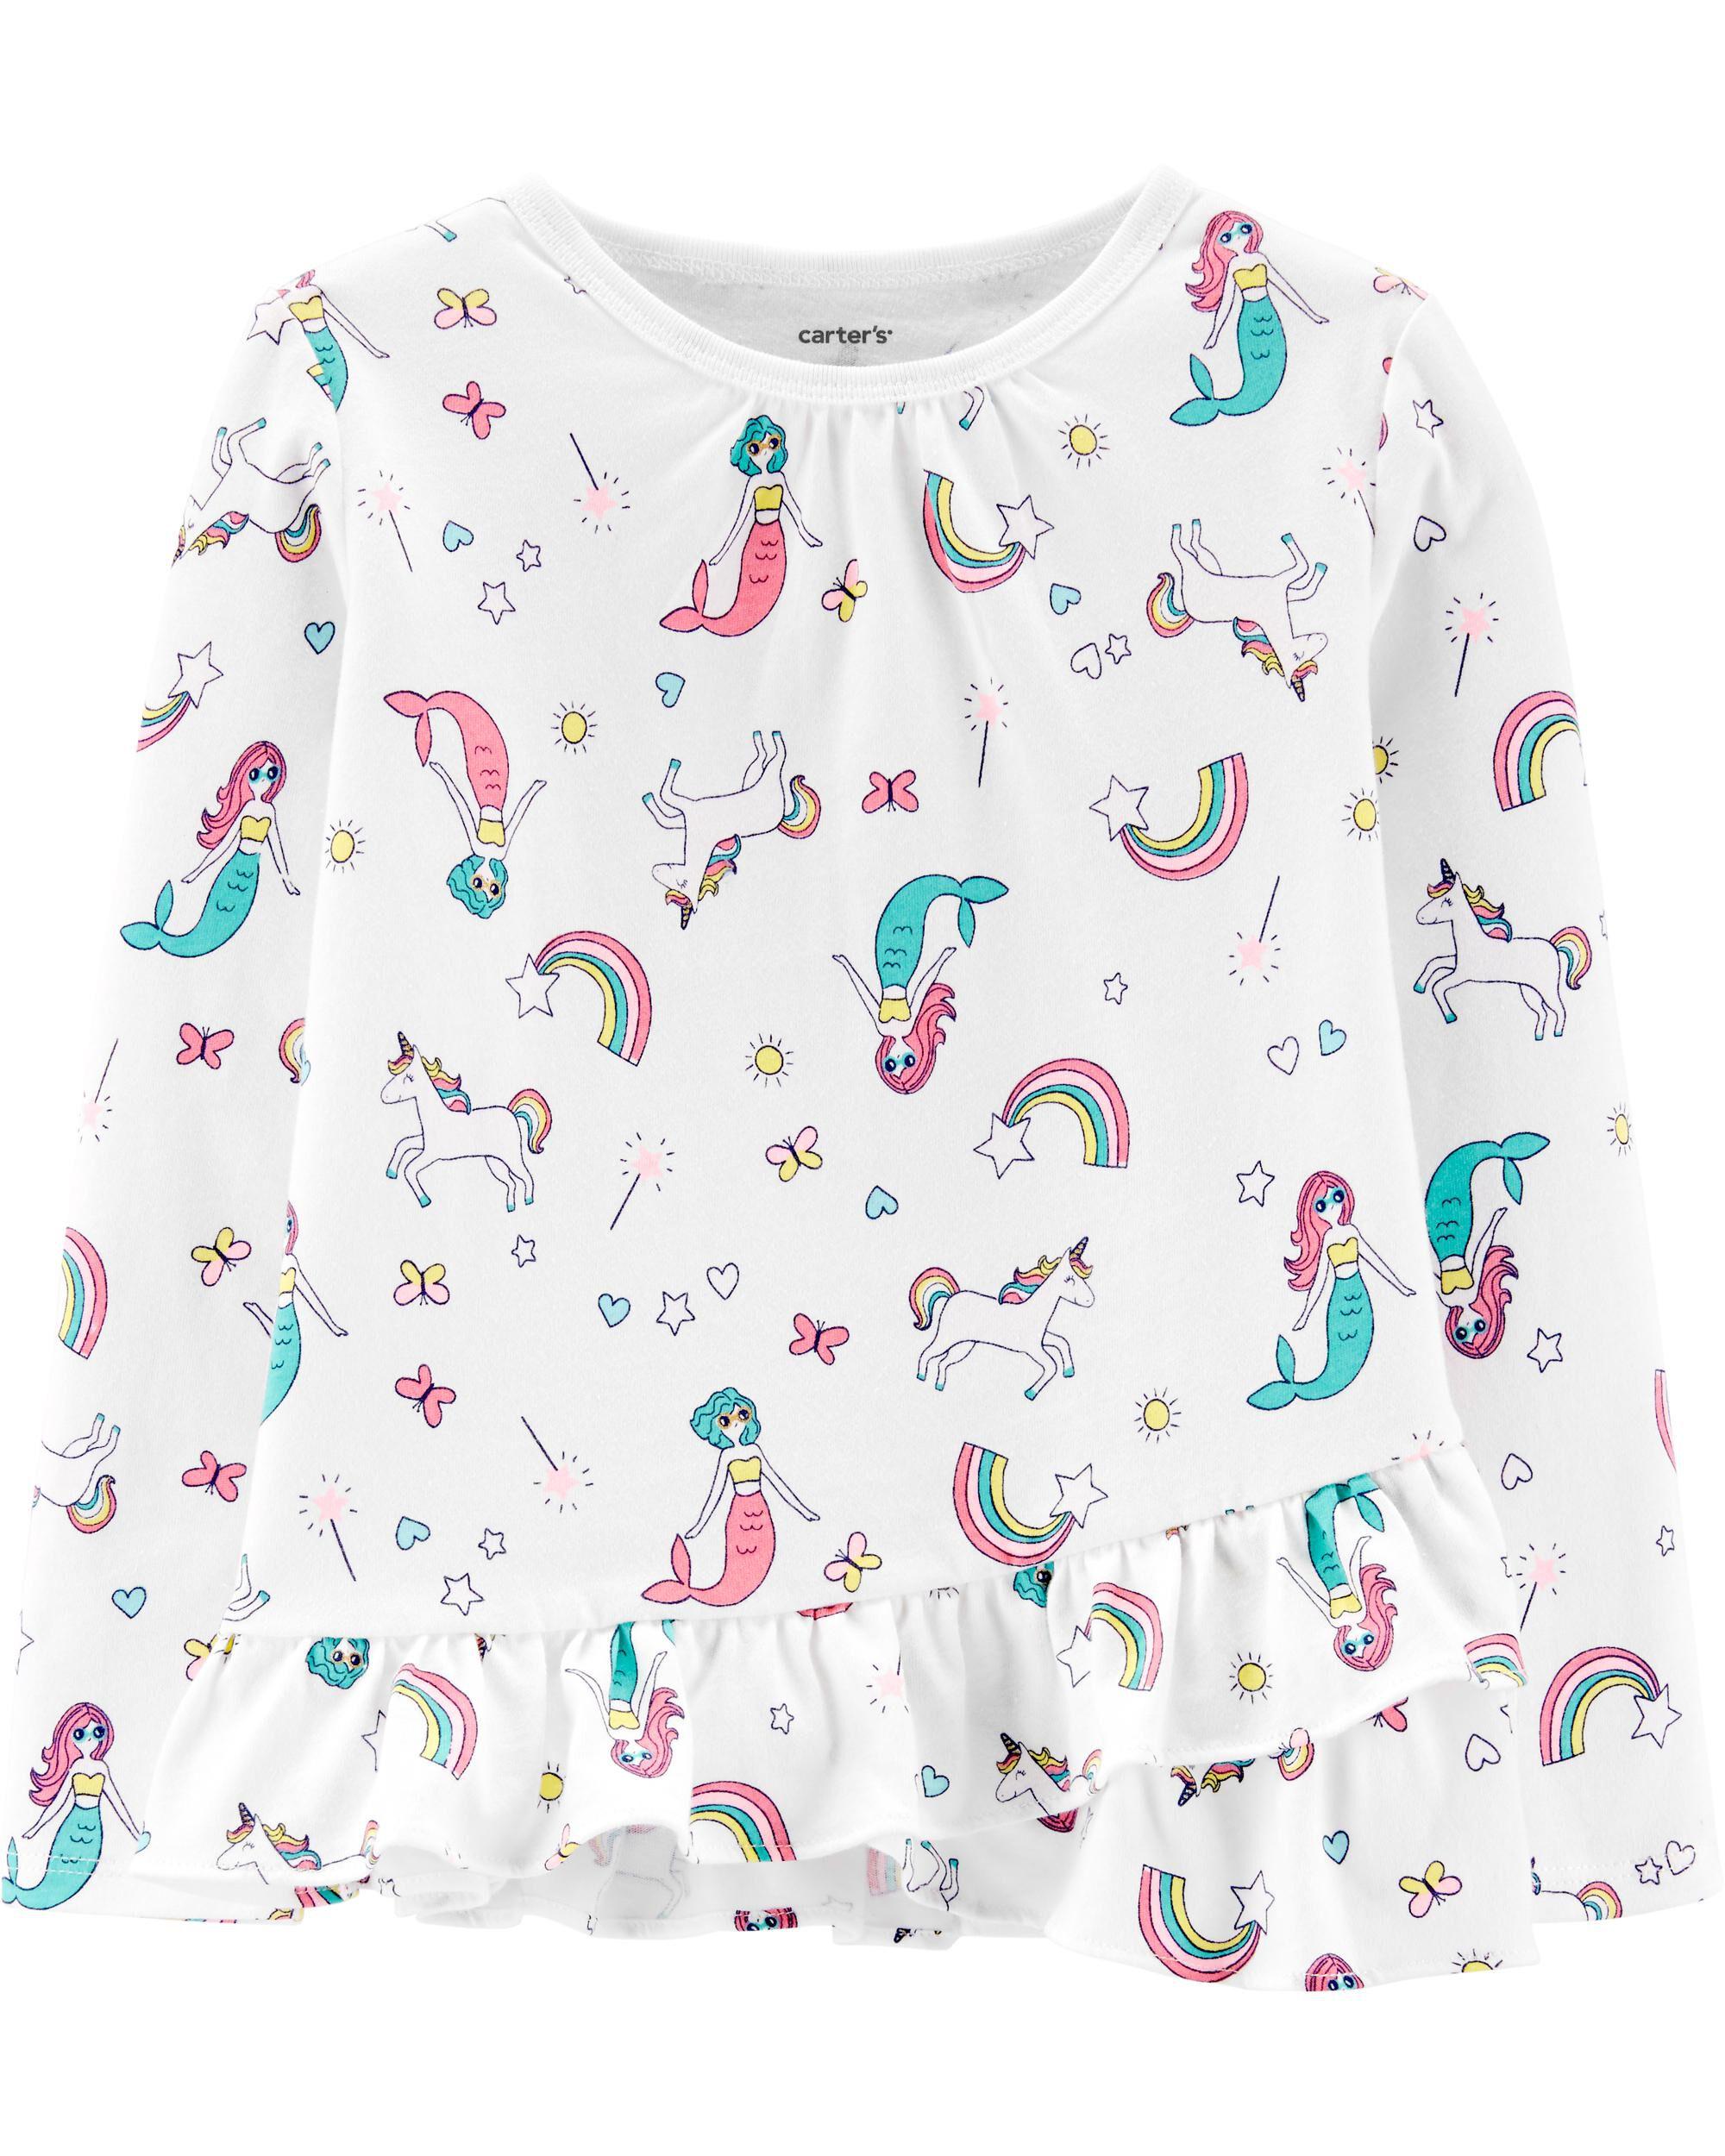 *CLEARANCE* Mermaids & Unicorns Ruffle Jersey Tee